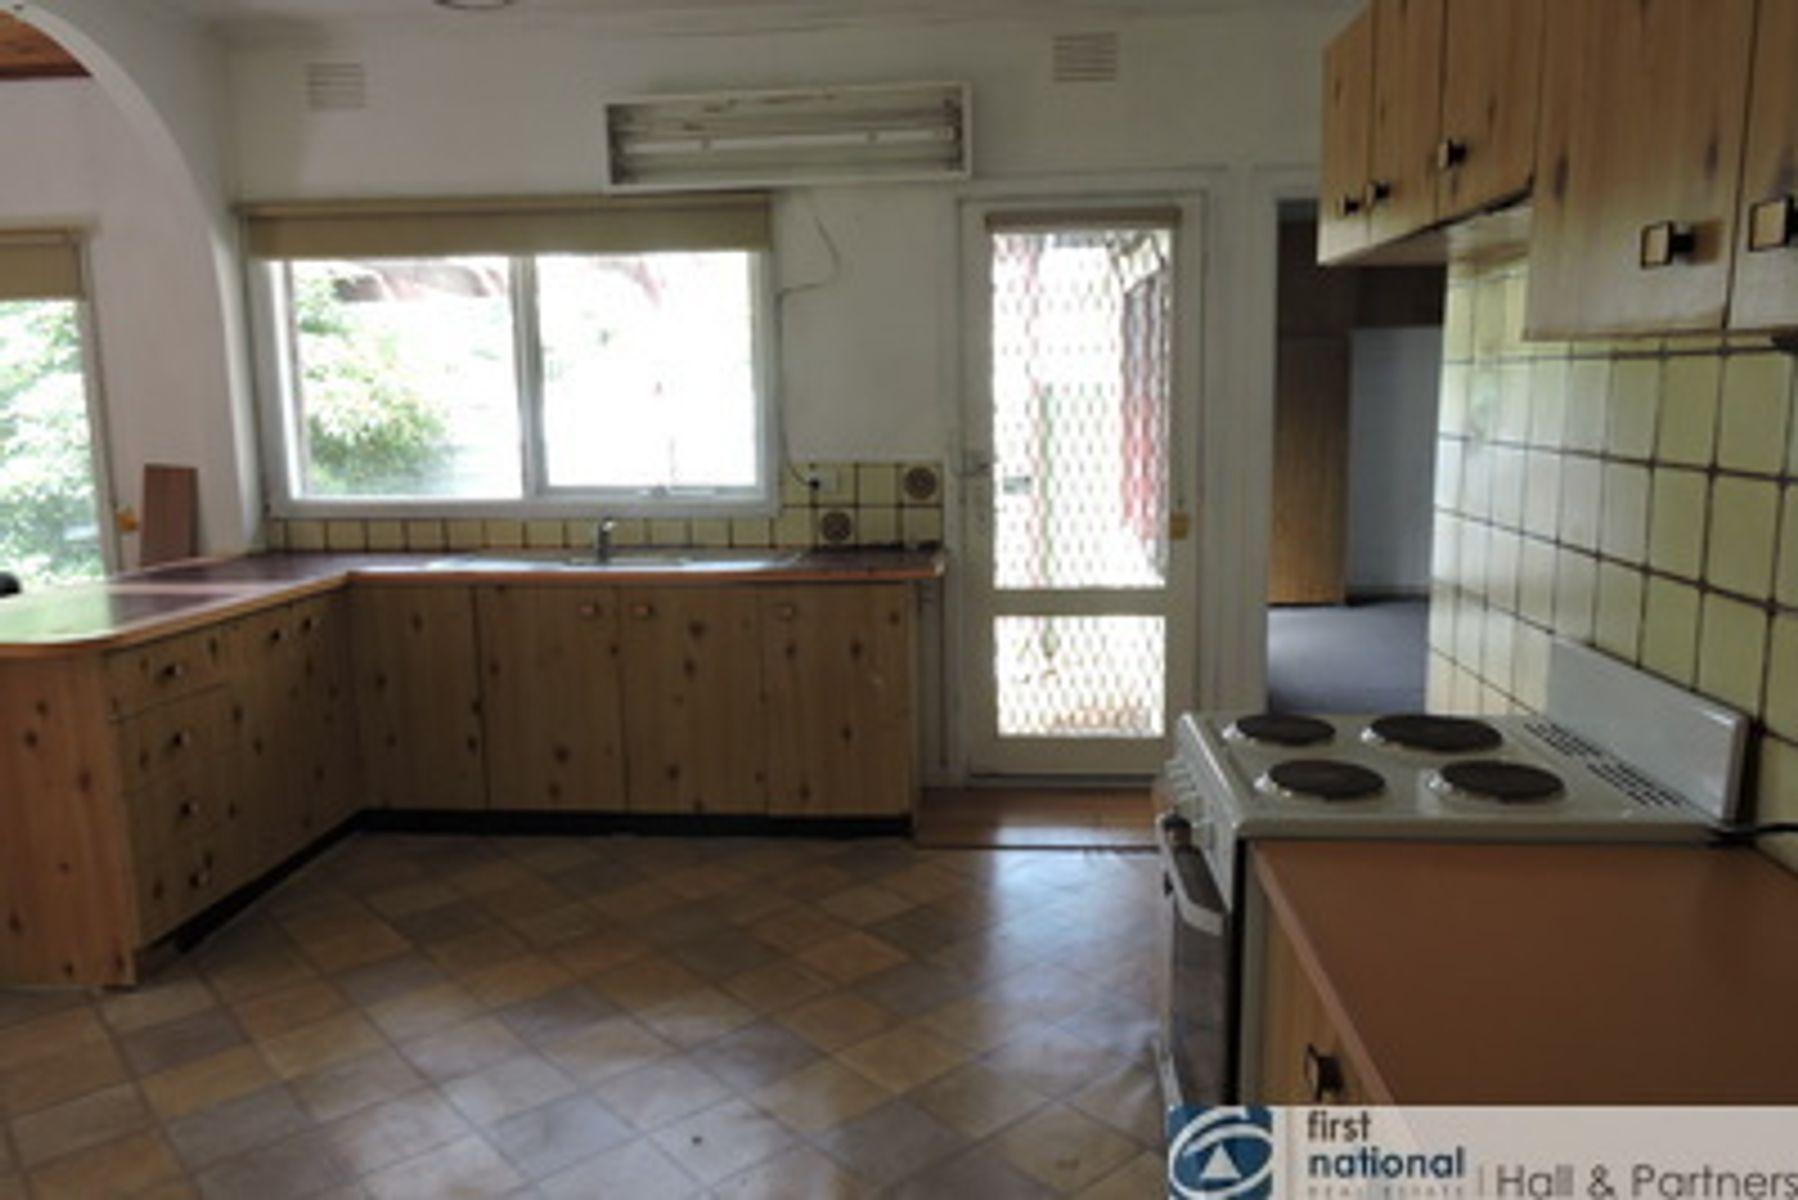 2 Grant Street, Dandenong, VIC 3175